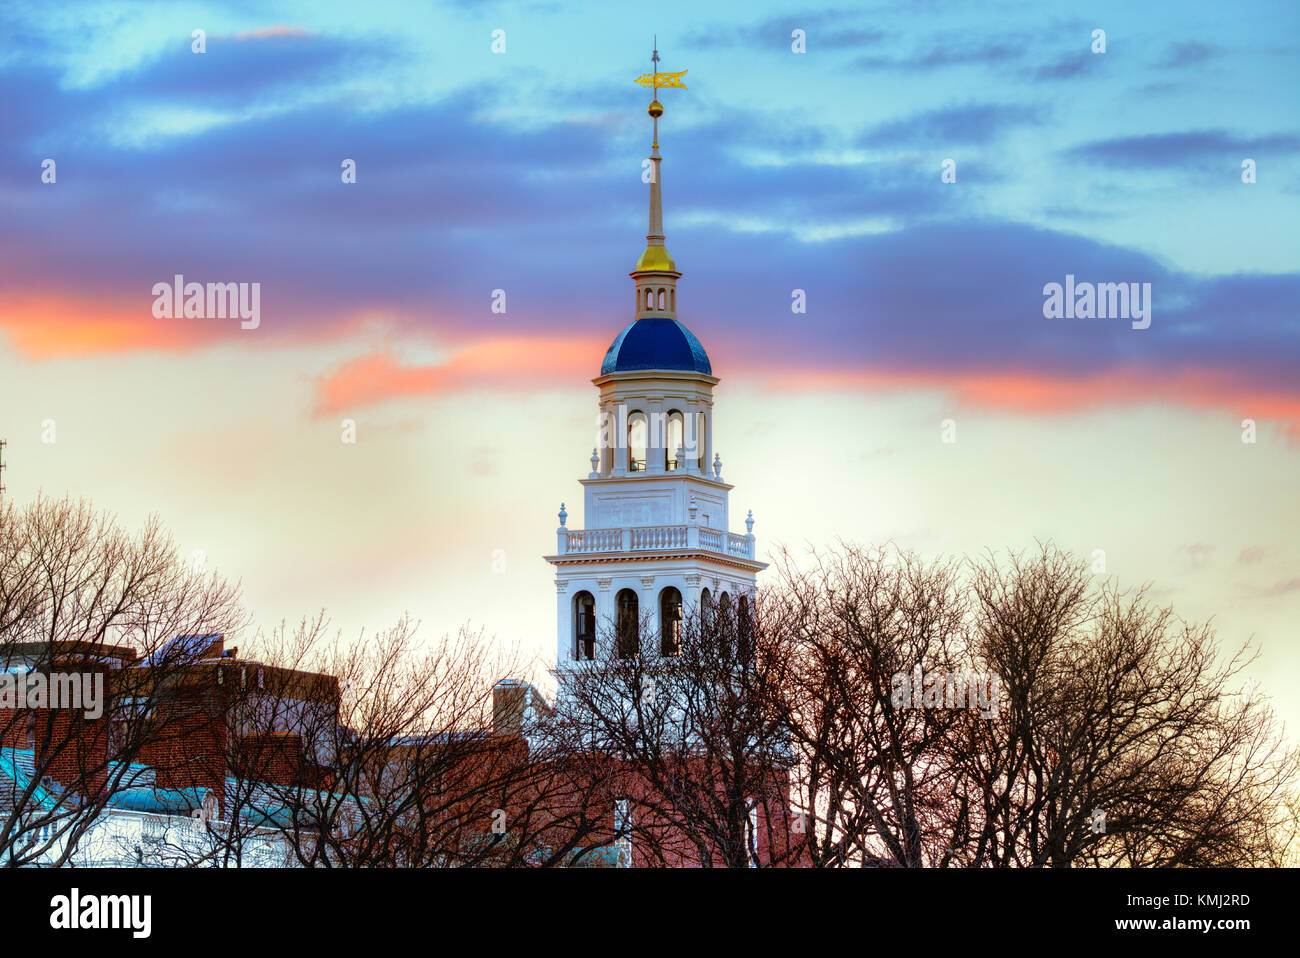 Lowell House, Harvard University. White bell tower, iconic blue dome, sunset sky, winter scene. - Stock Image